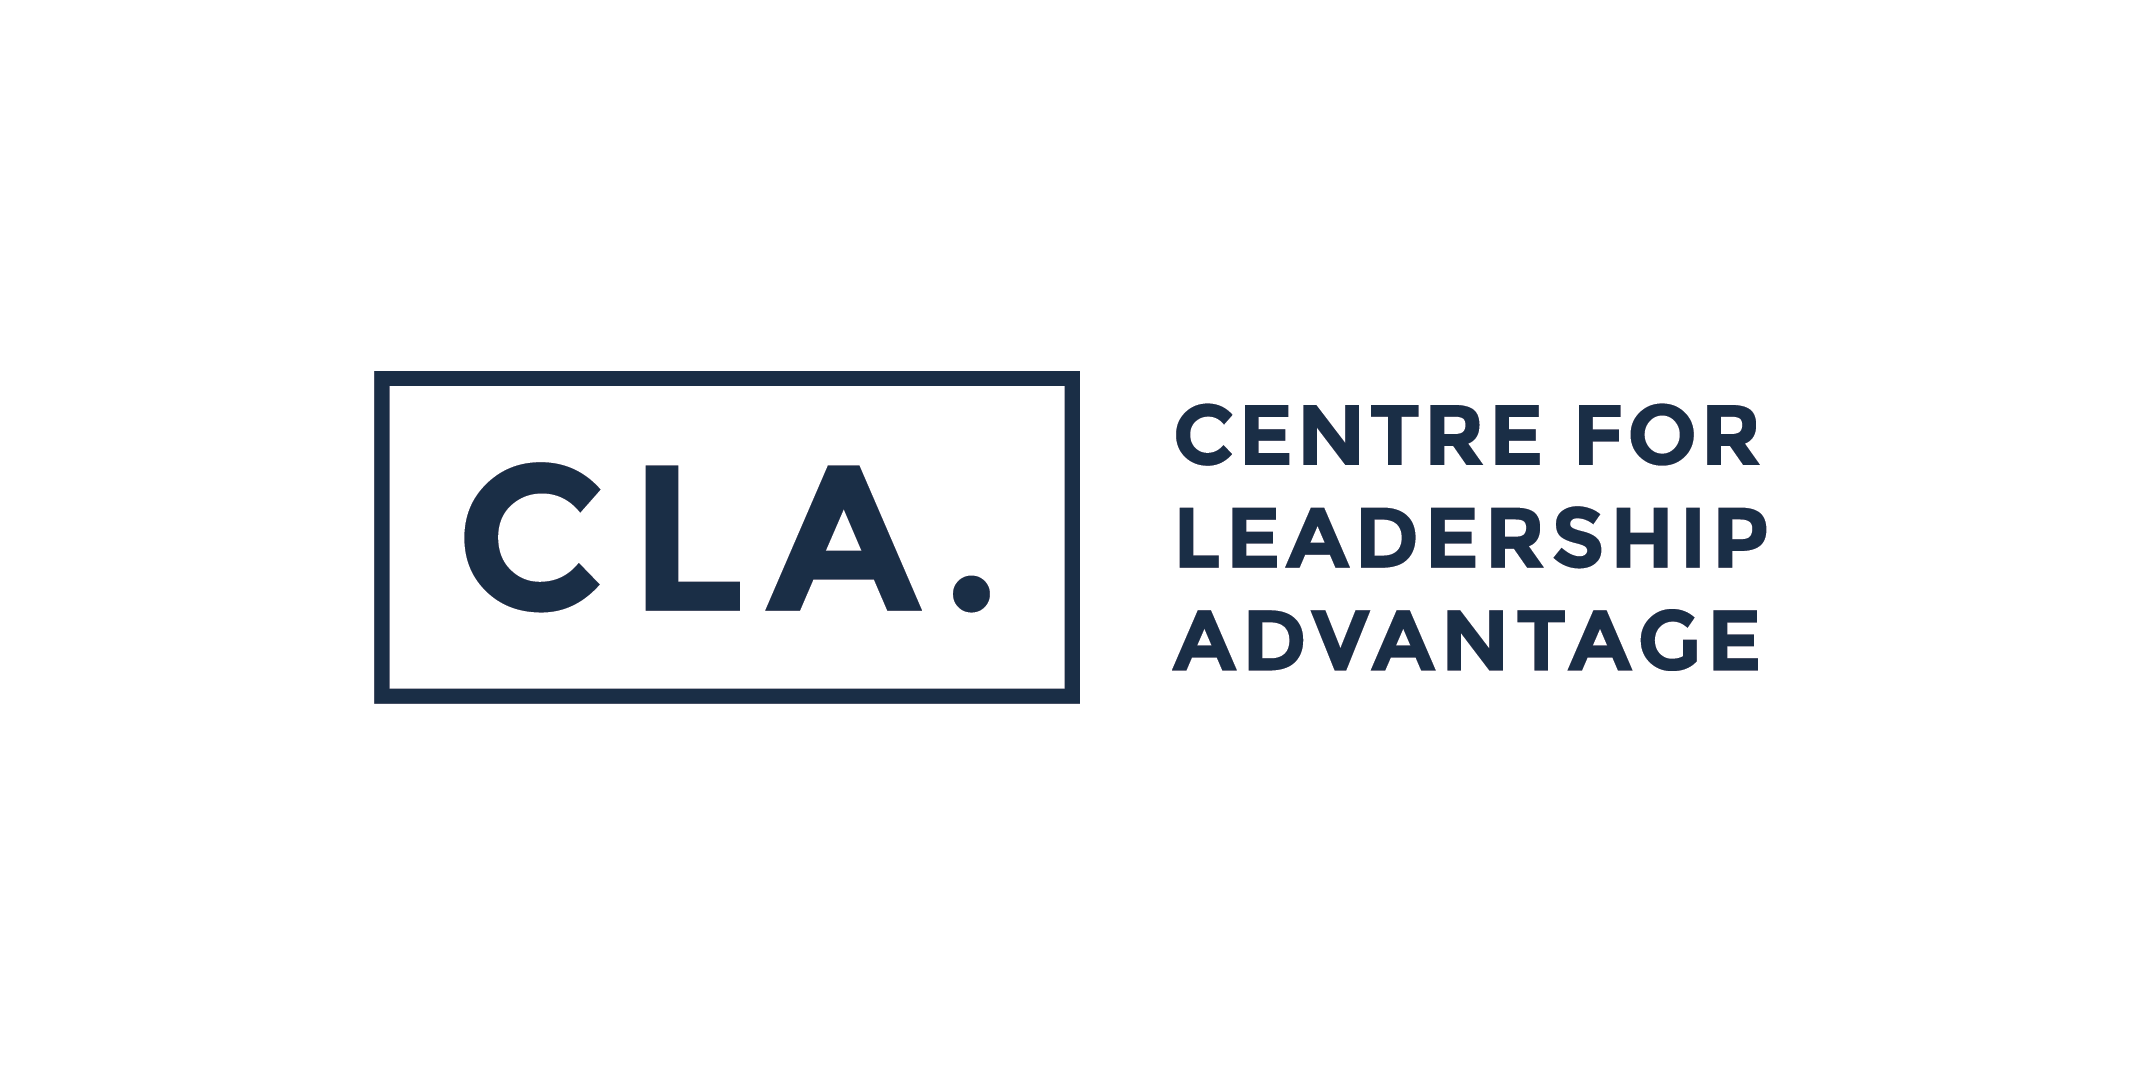 Centre for leadership advantage (CLA) Logo